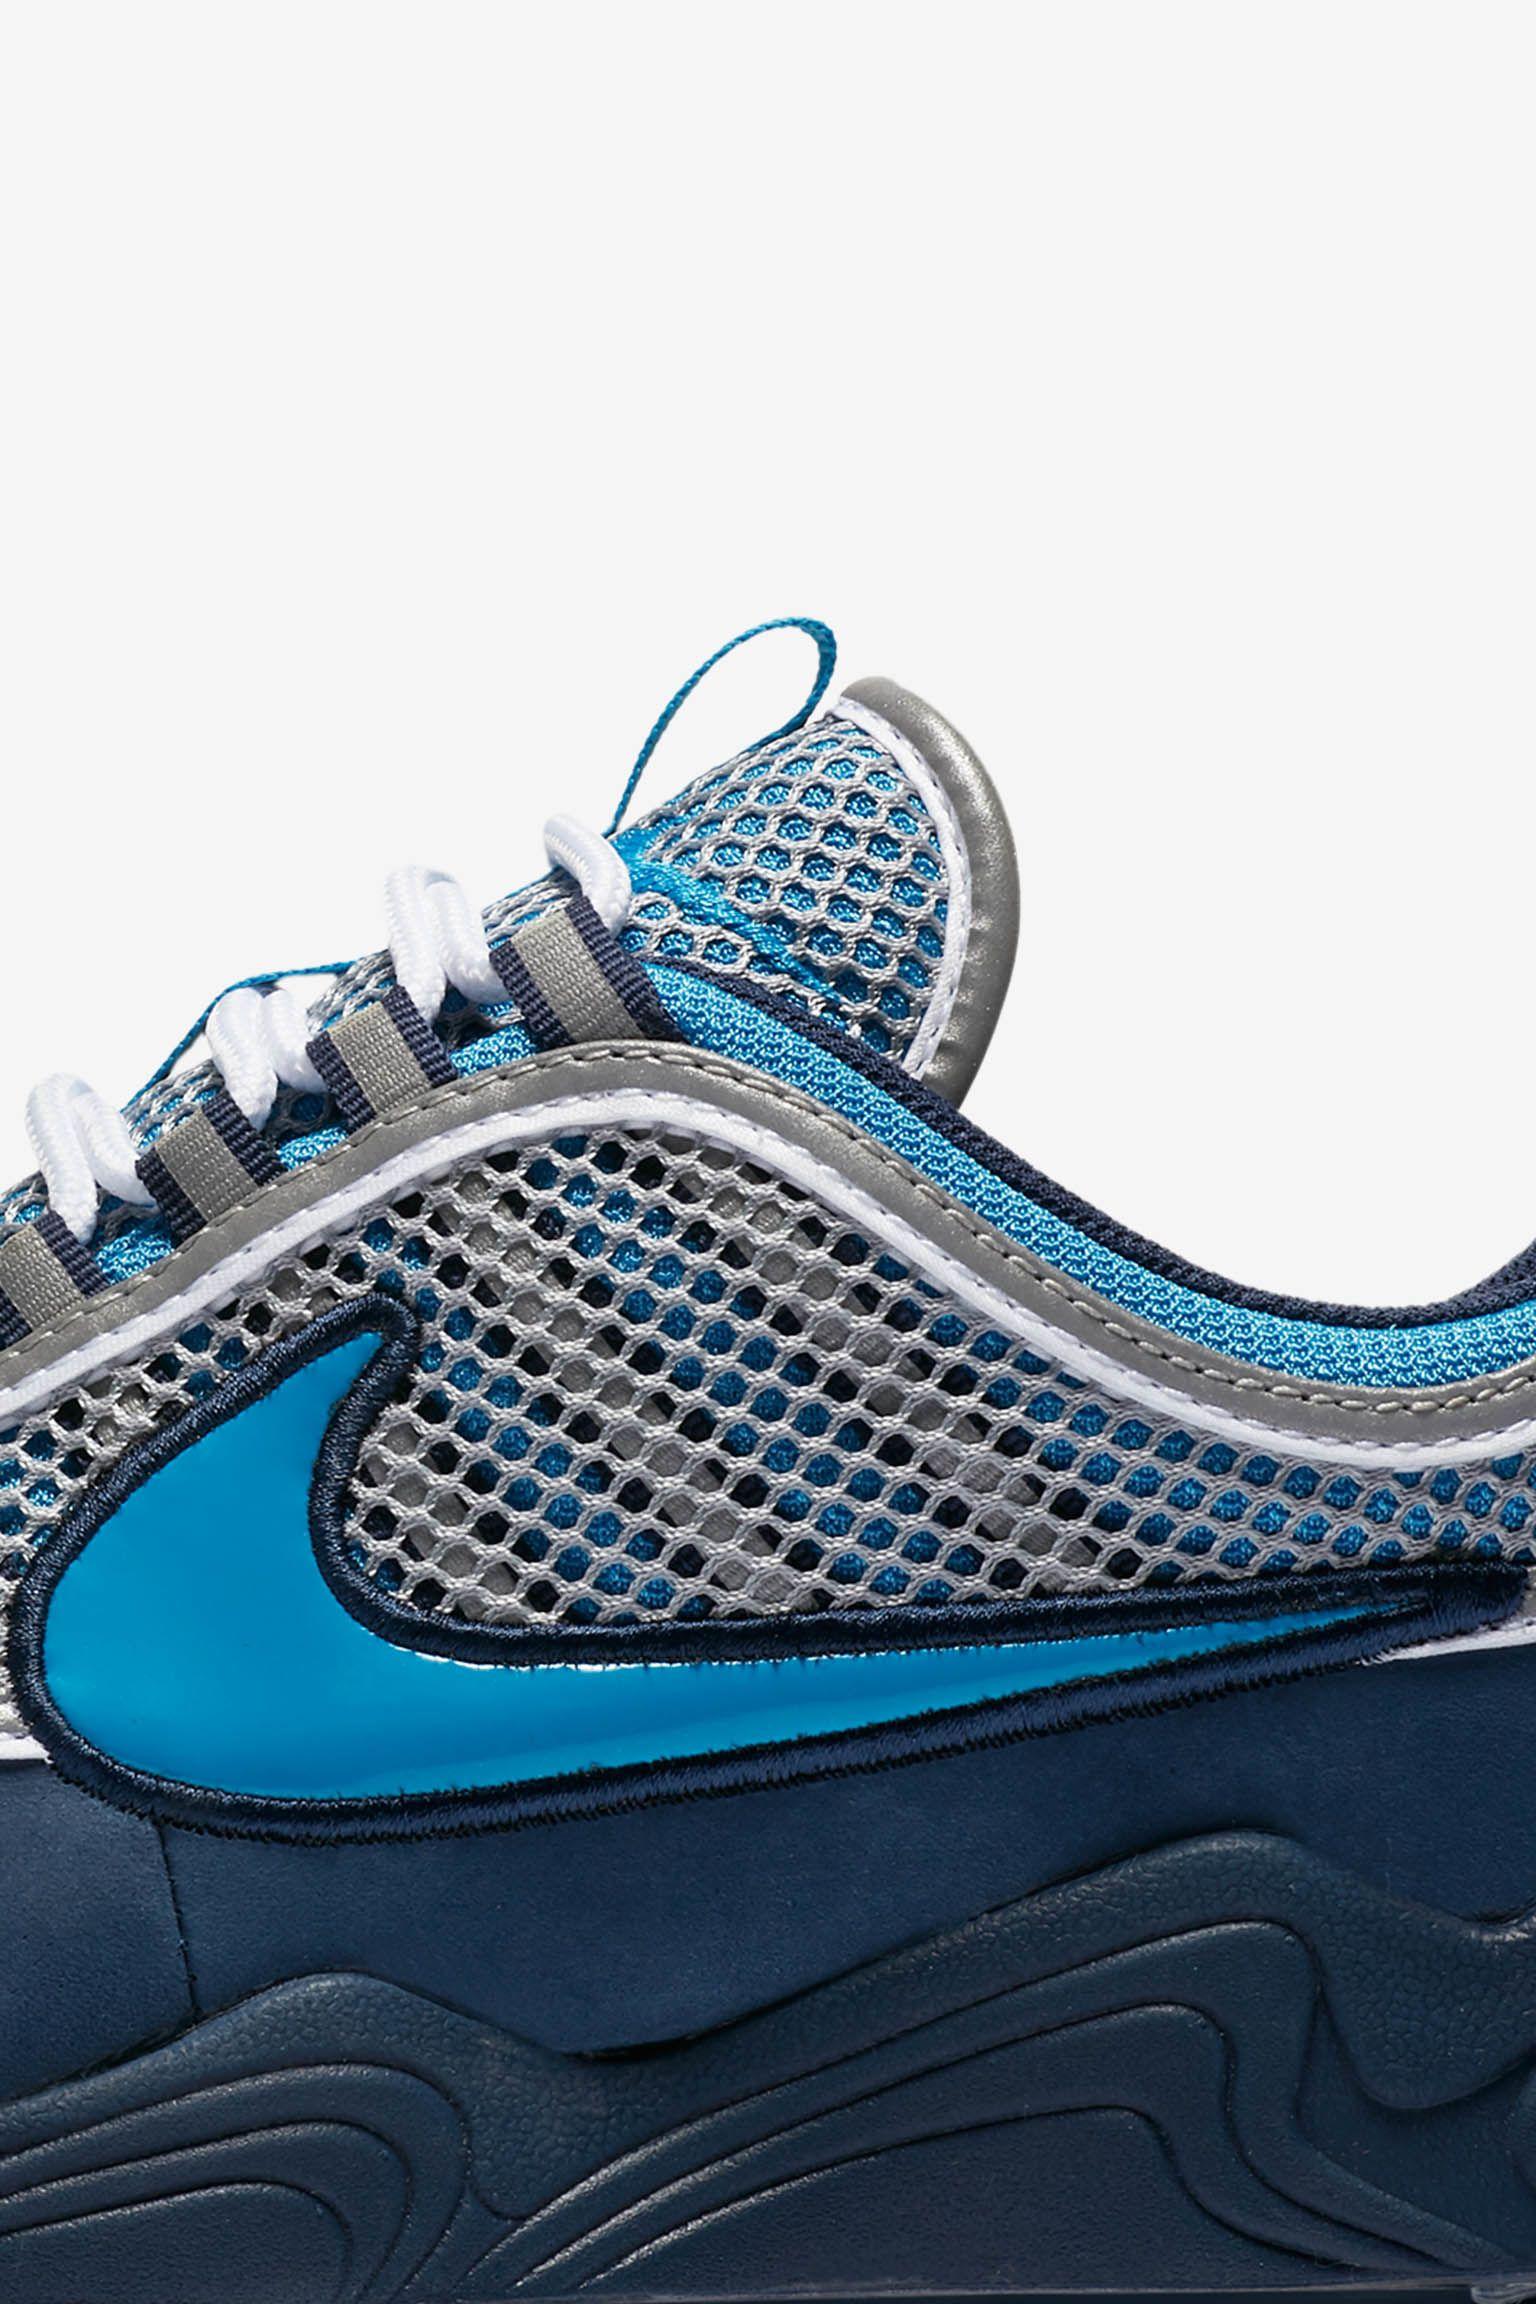 Nike Air Zoom Spiridon 'Stash' Release Date